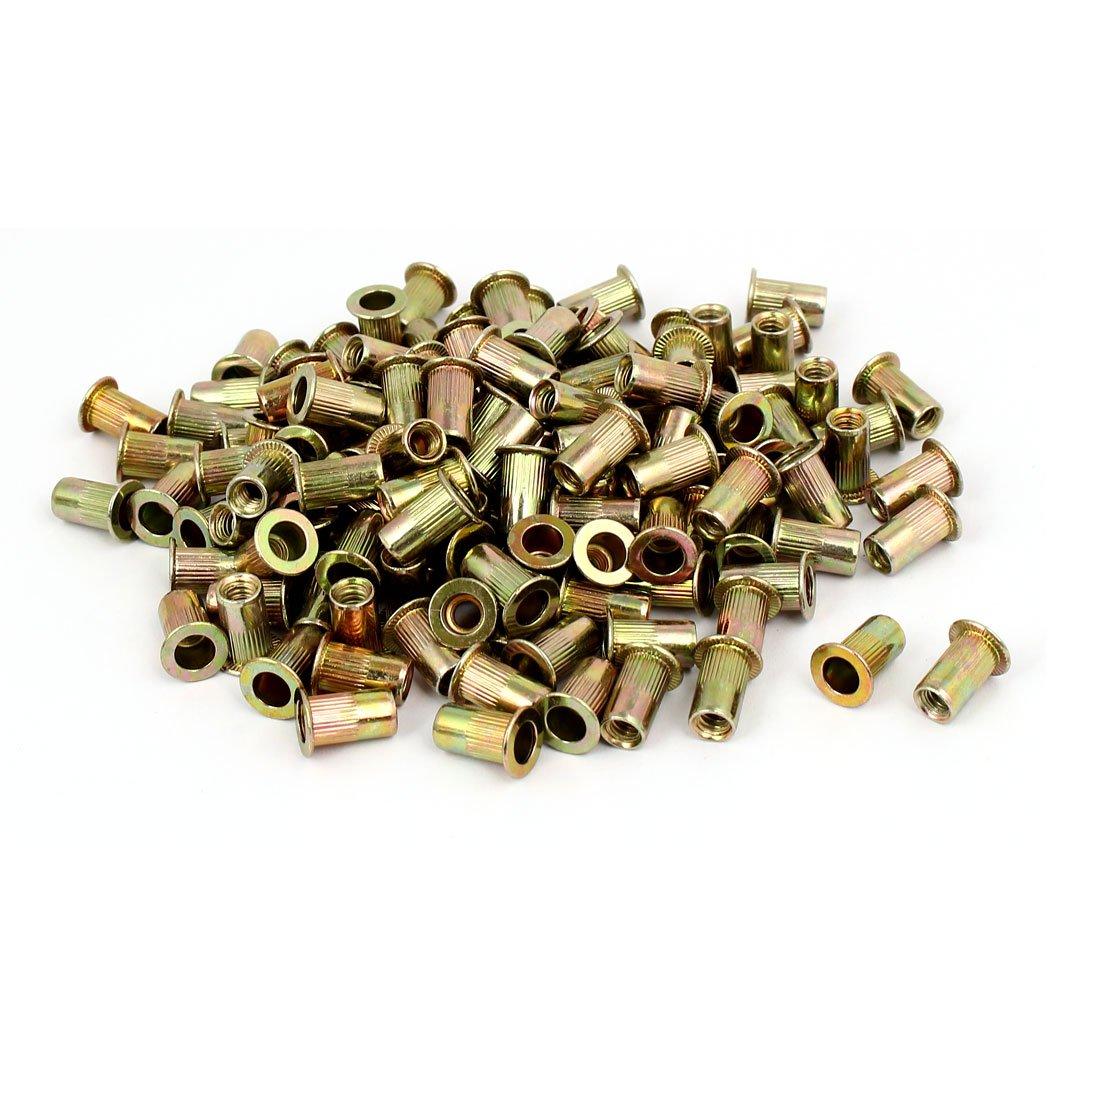 uxcell 10#24 Straight Knurled Rivet Nut Insert Nutsert Bronze Tone 150pcs